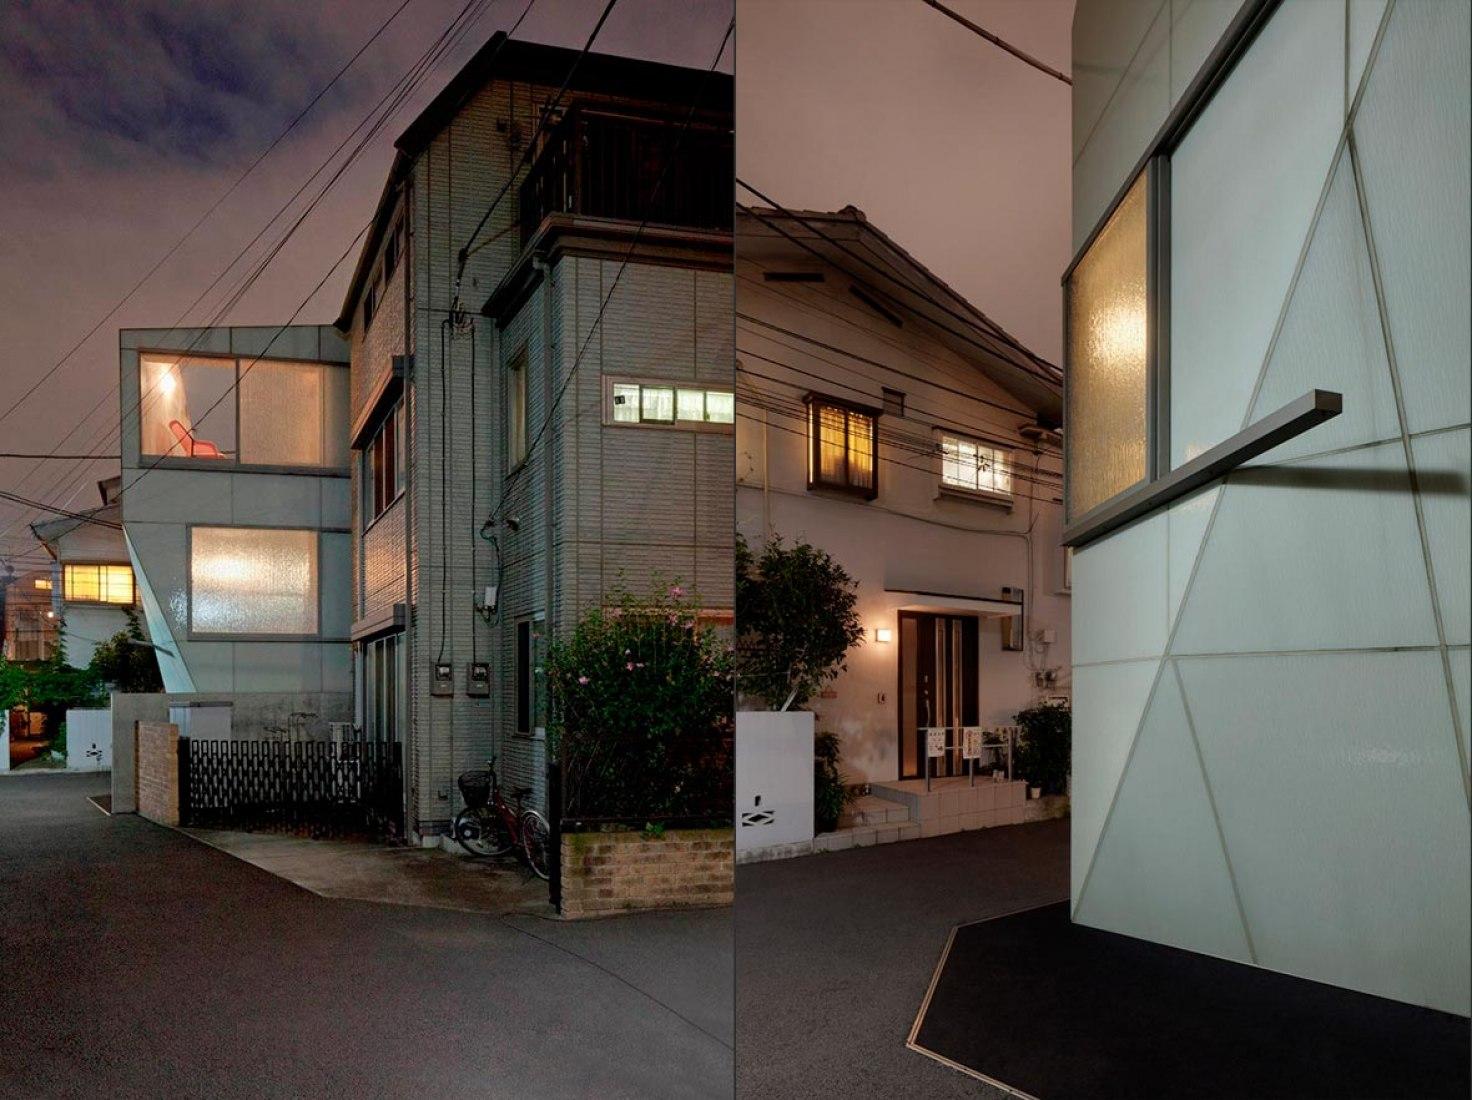 Detalle. Casa A' por Wiel Arets Architects. Fotografía © Jan Bitter.